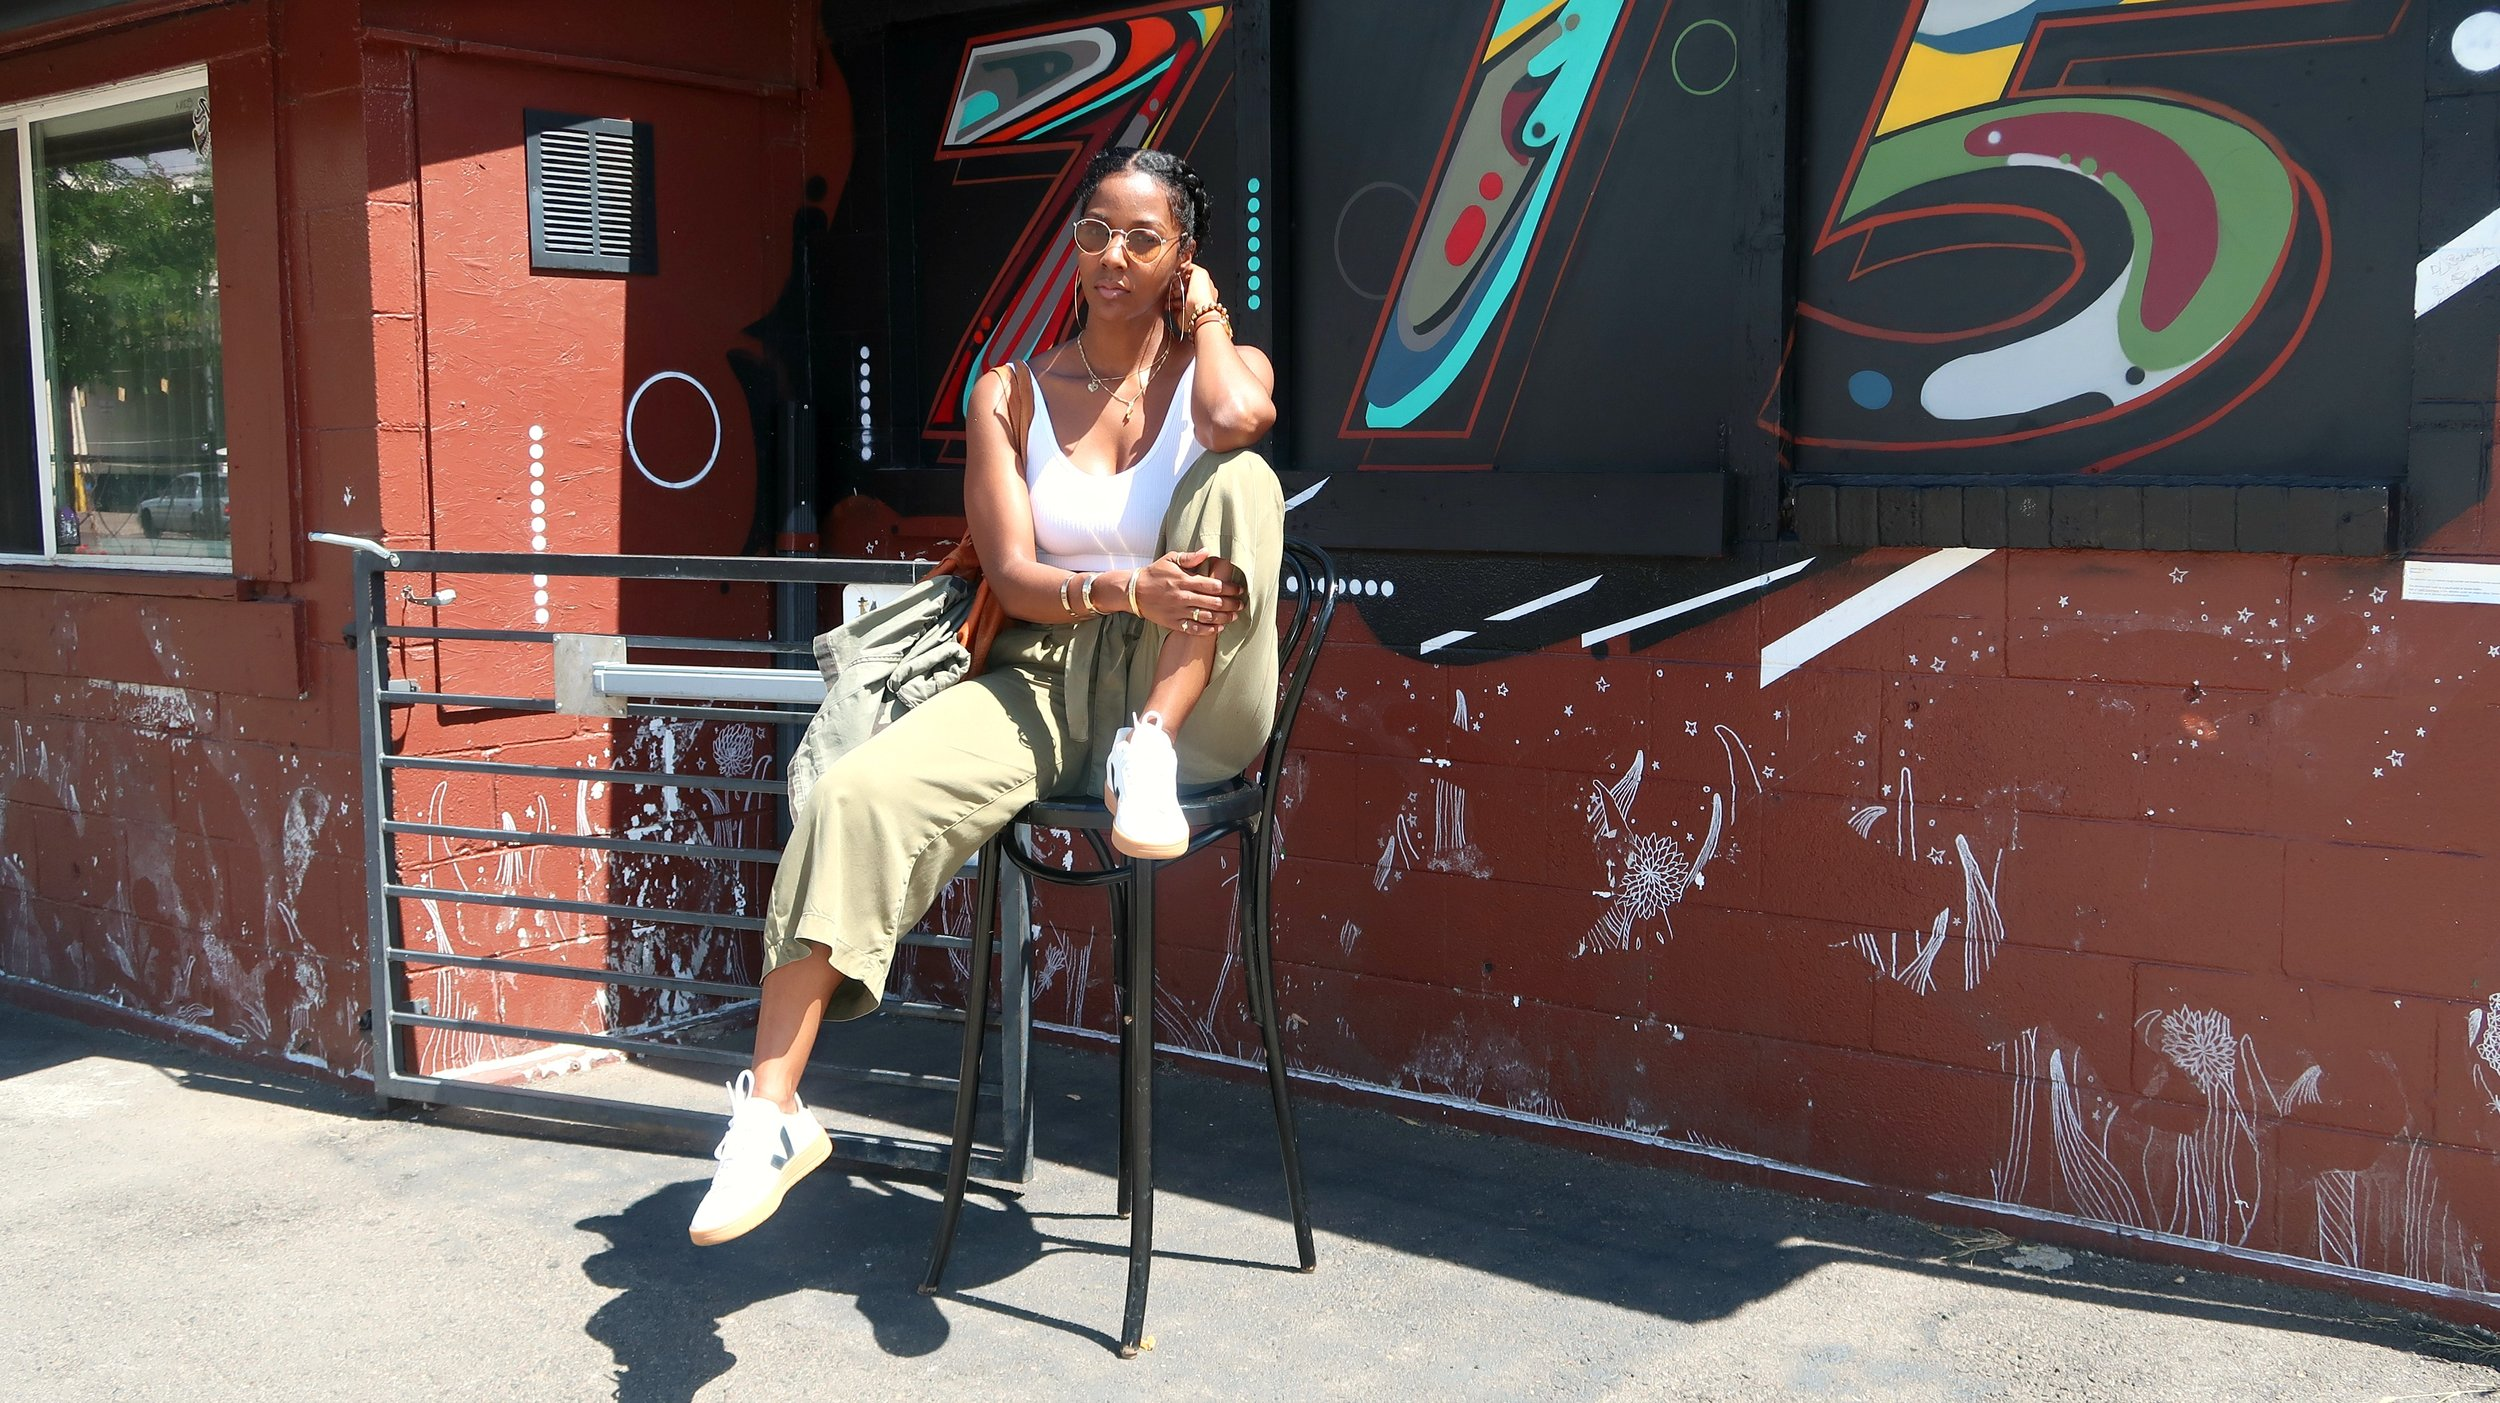 Veja v-12 sneakers, Black Fashion Bloggers